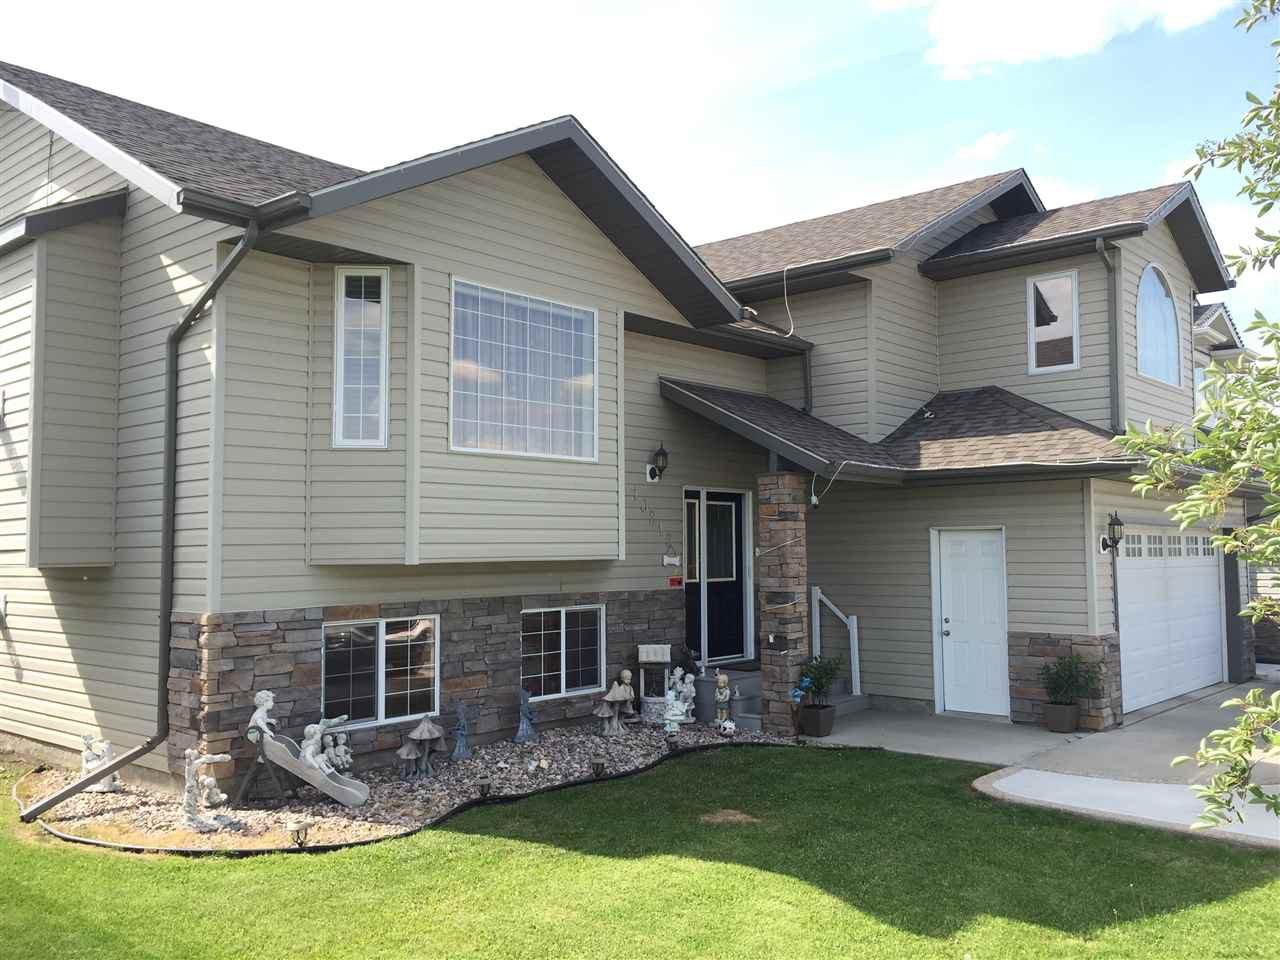 Main Photo: 10212 110 Avenue: Westlock House for sale : MLS®# E4221337